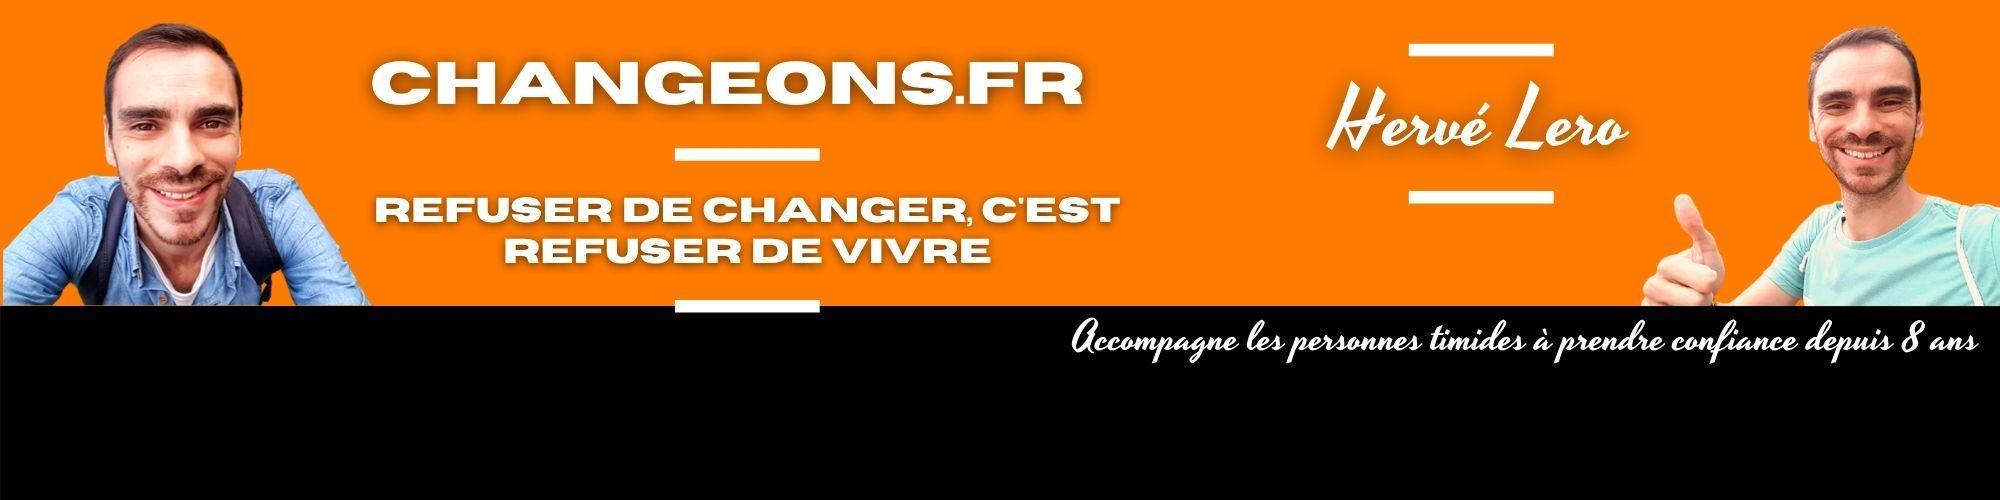 Hervé Lero changeons.fr